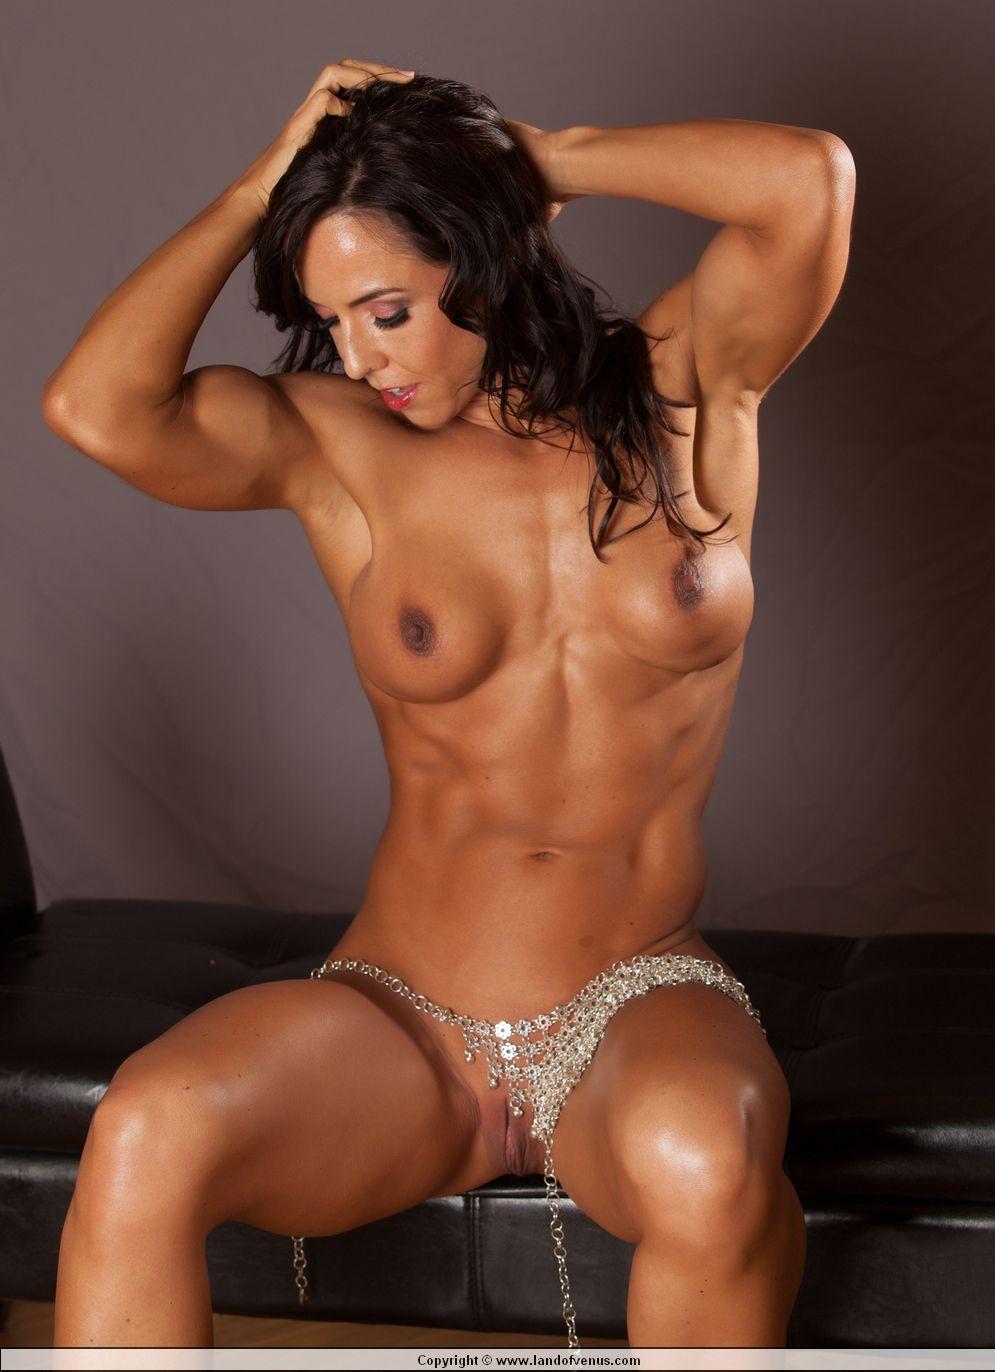 Muscle girl sex movie, ebony hot skinny chick nude